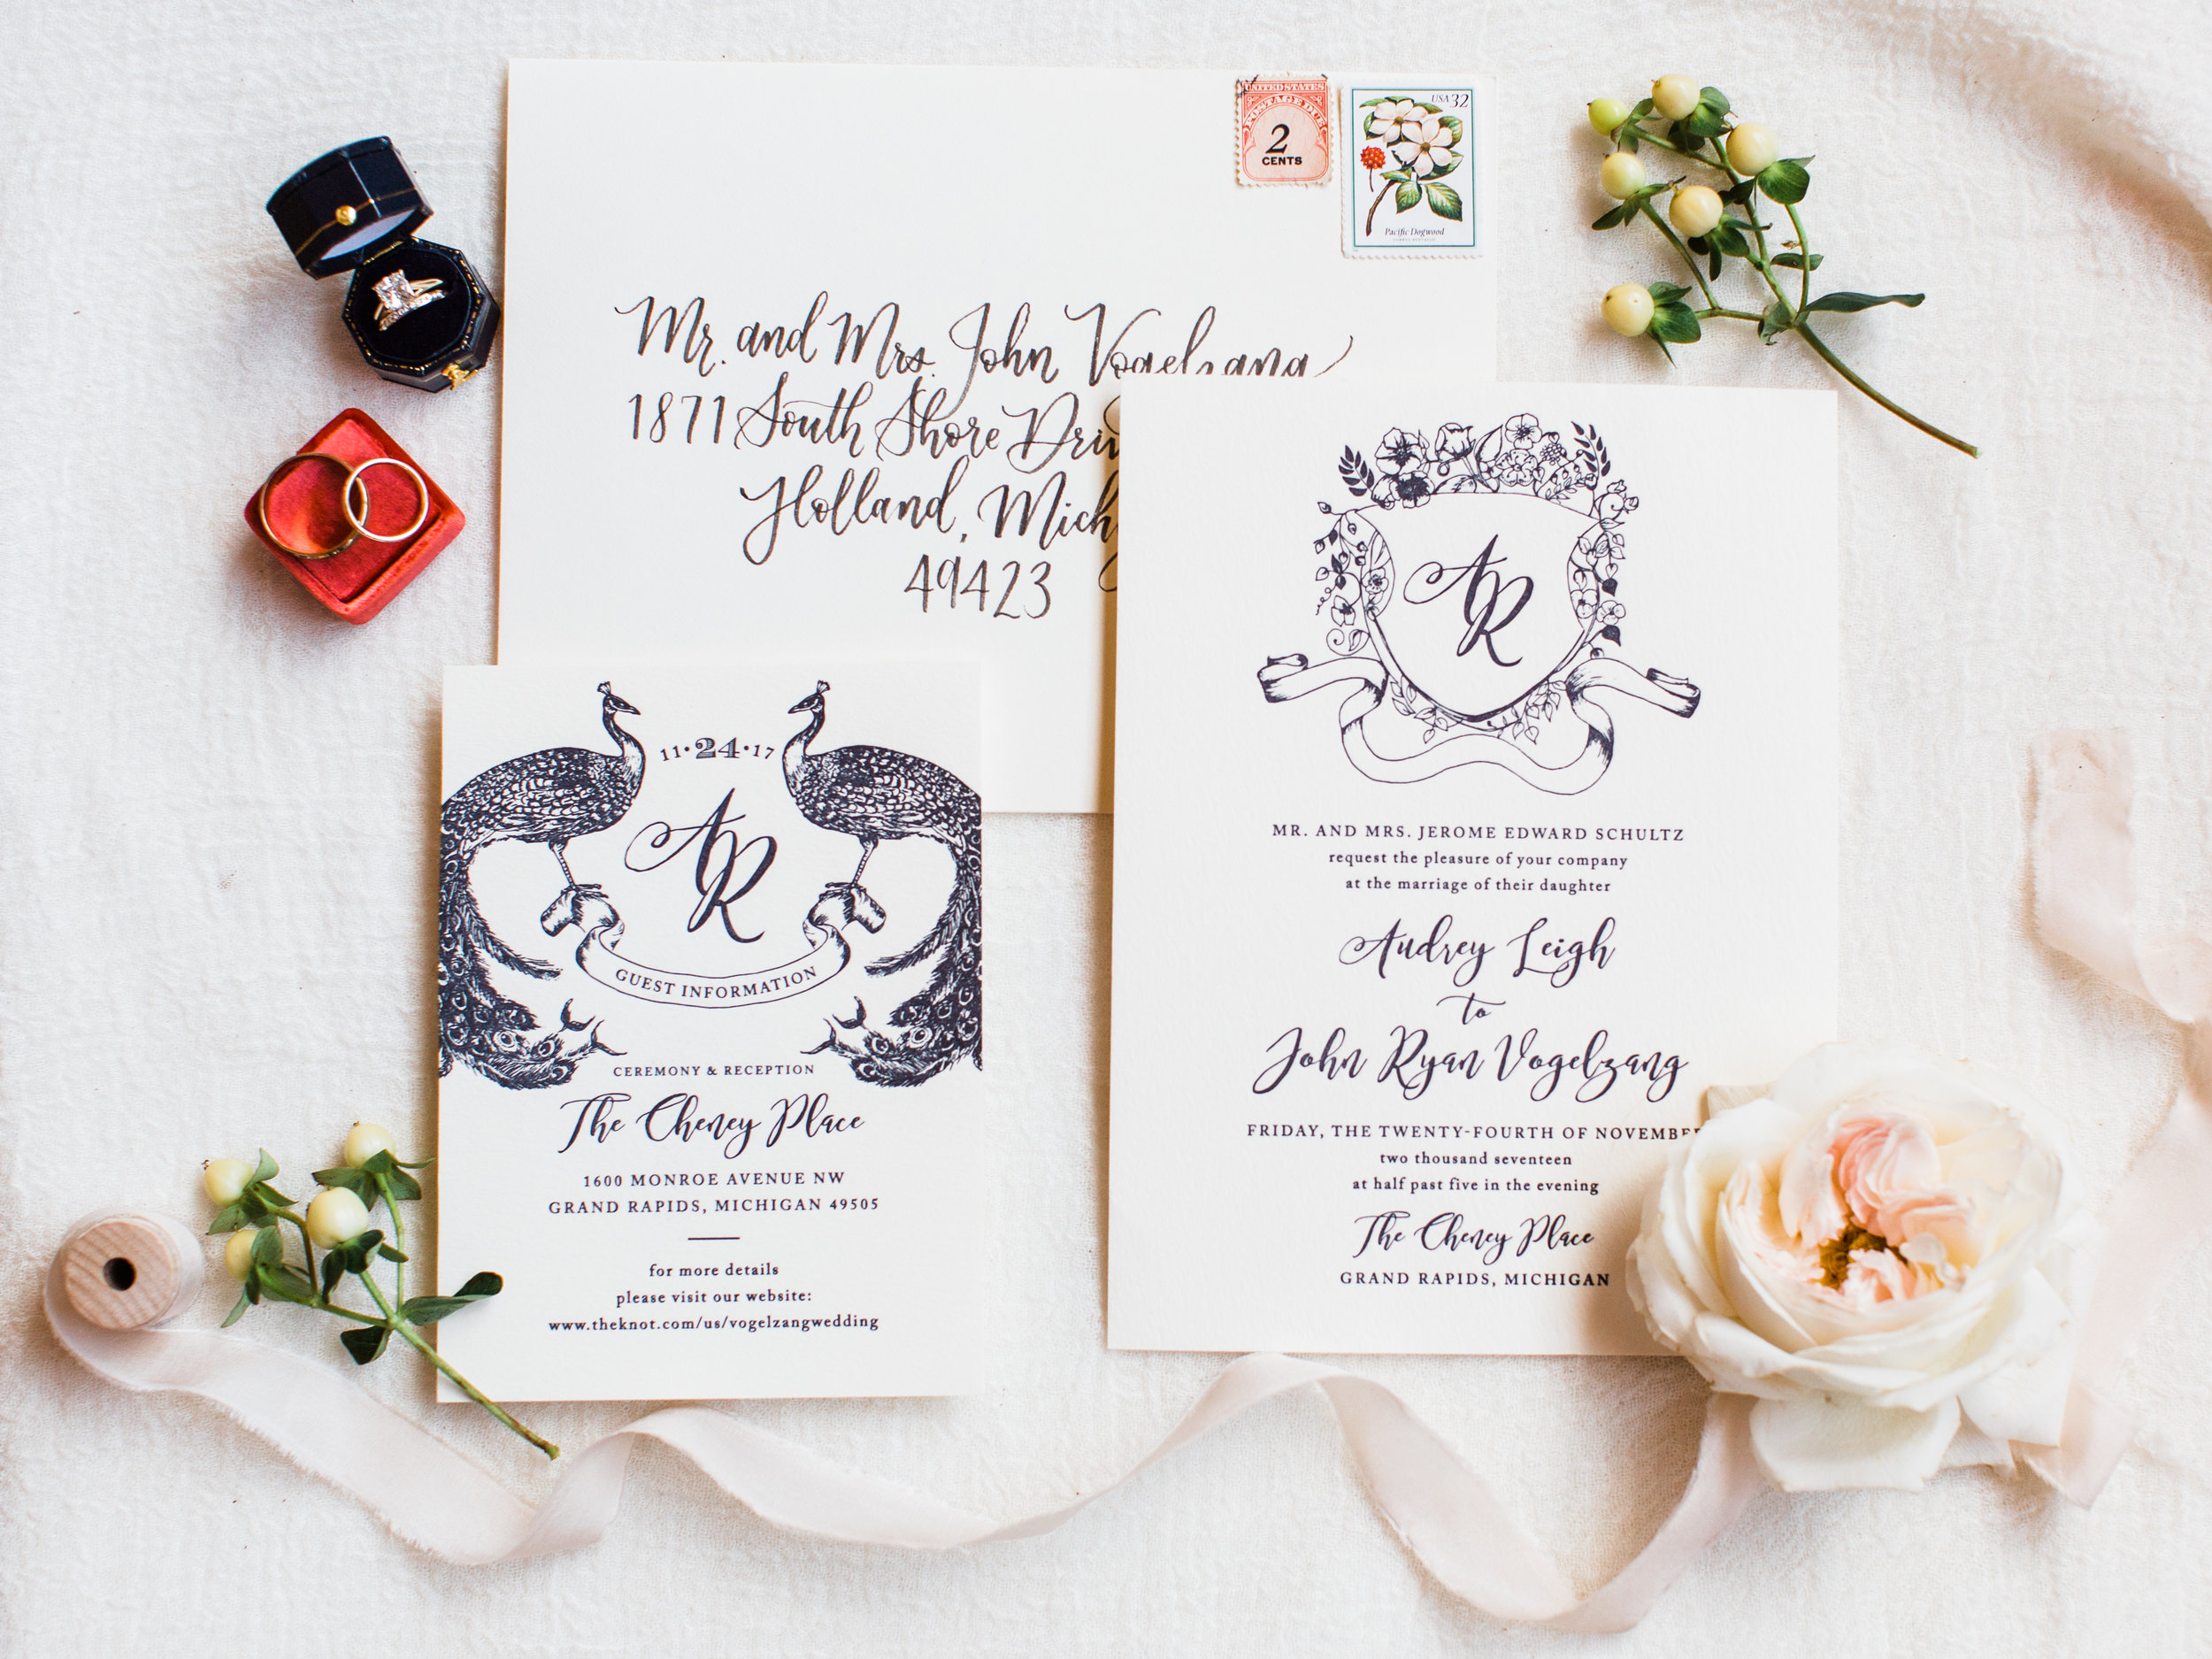 Vogelzang+Wedding+Details-18.jpg